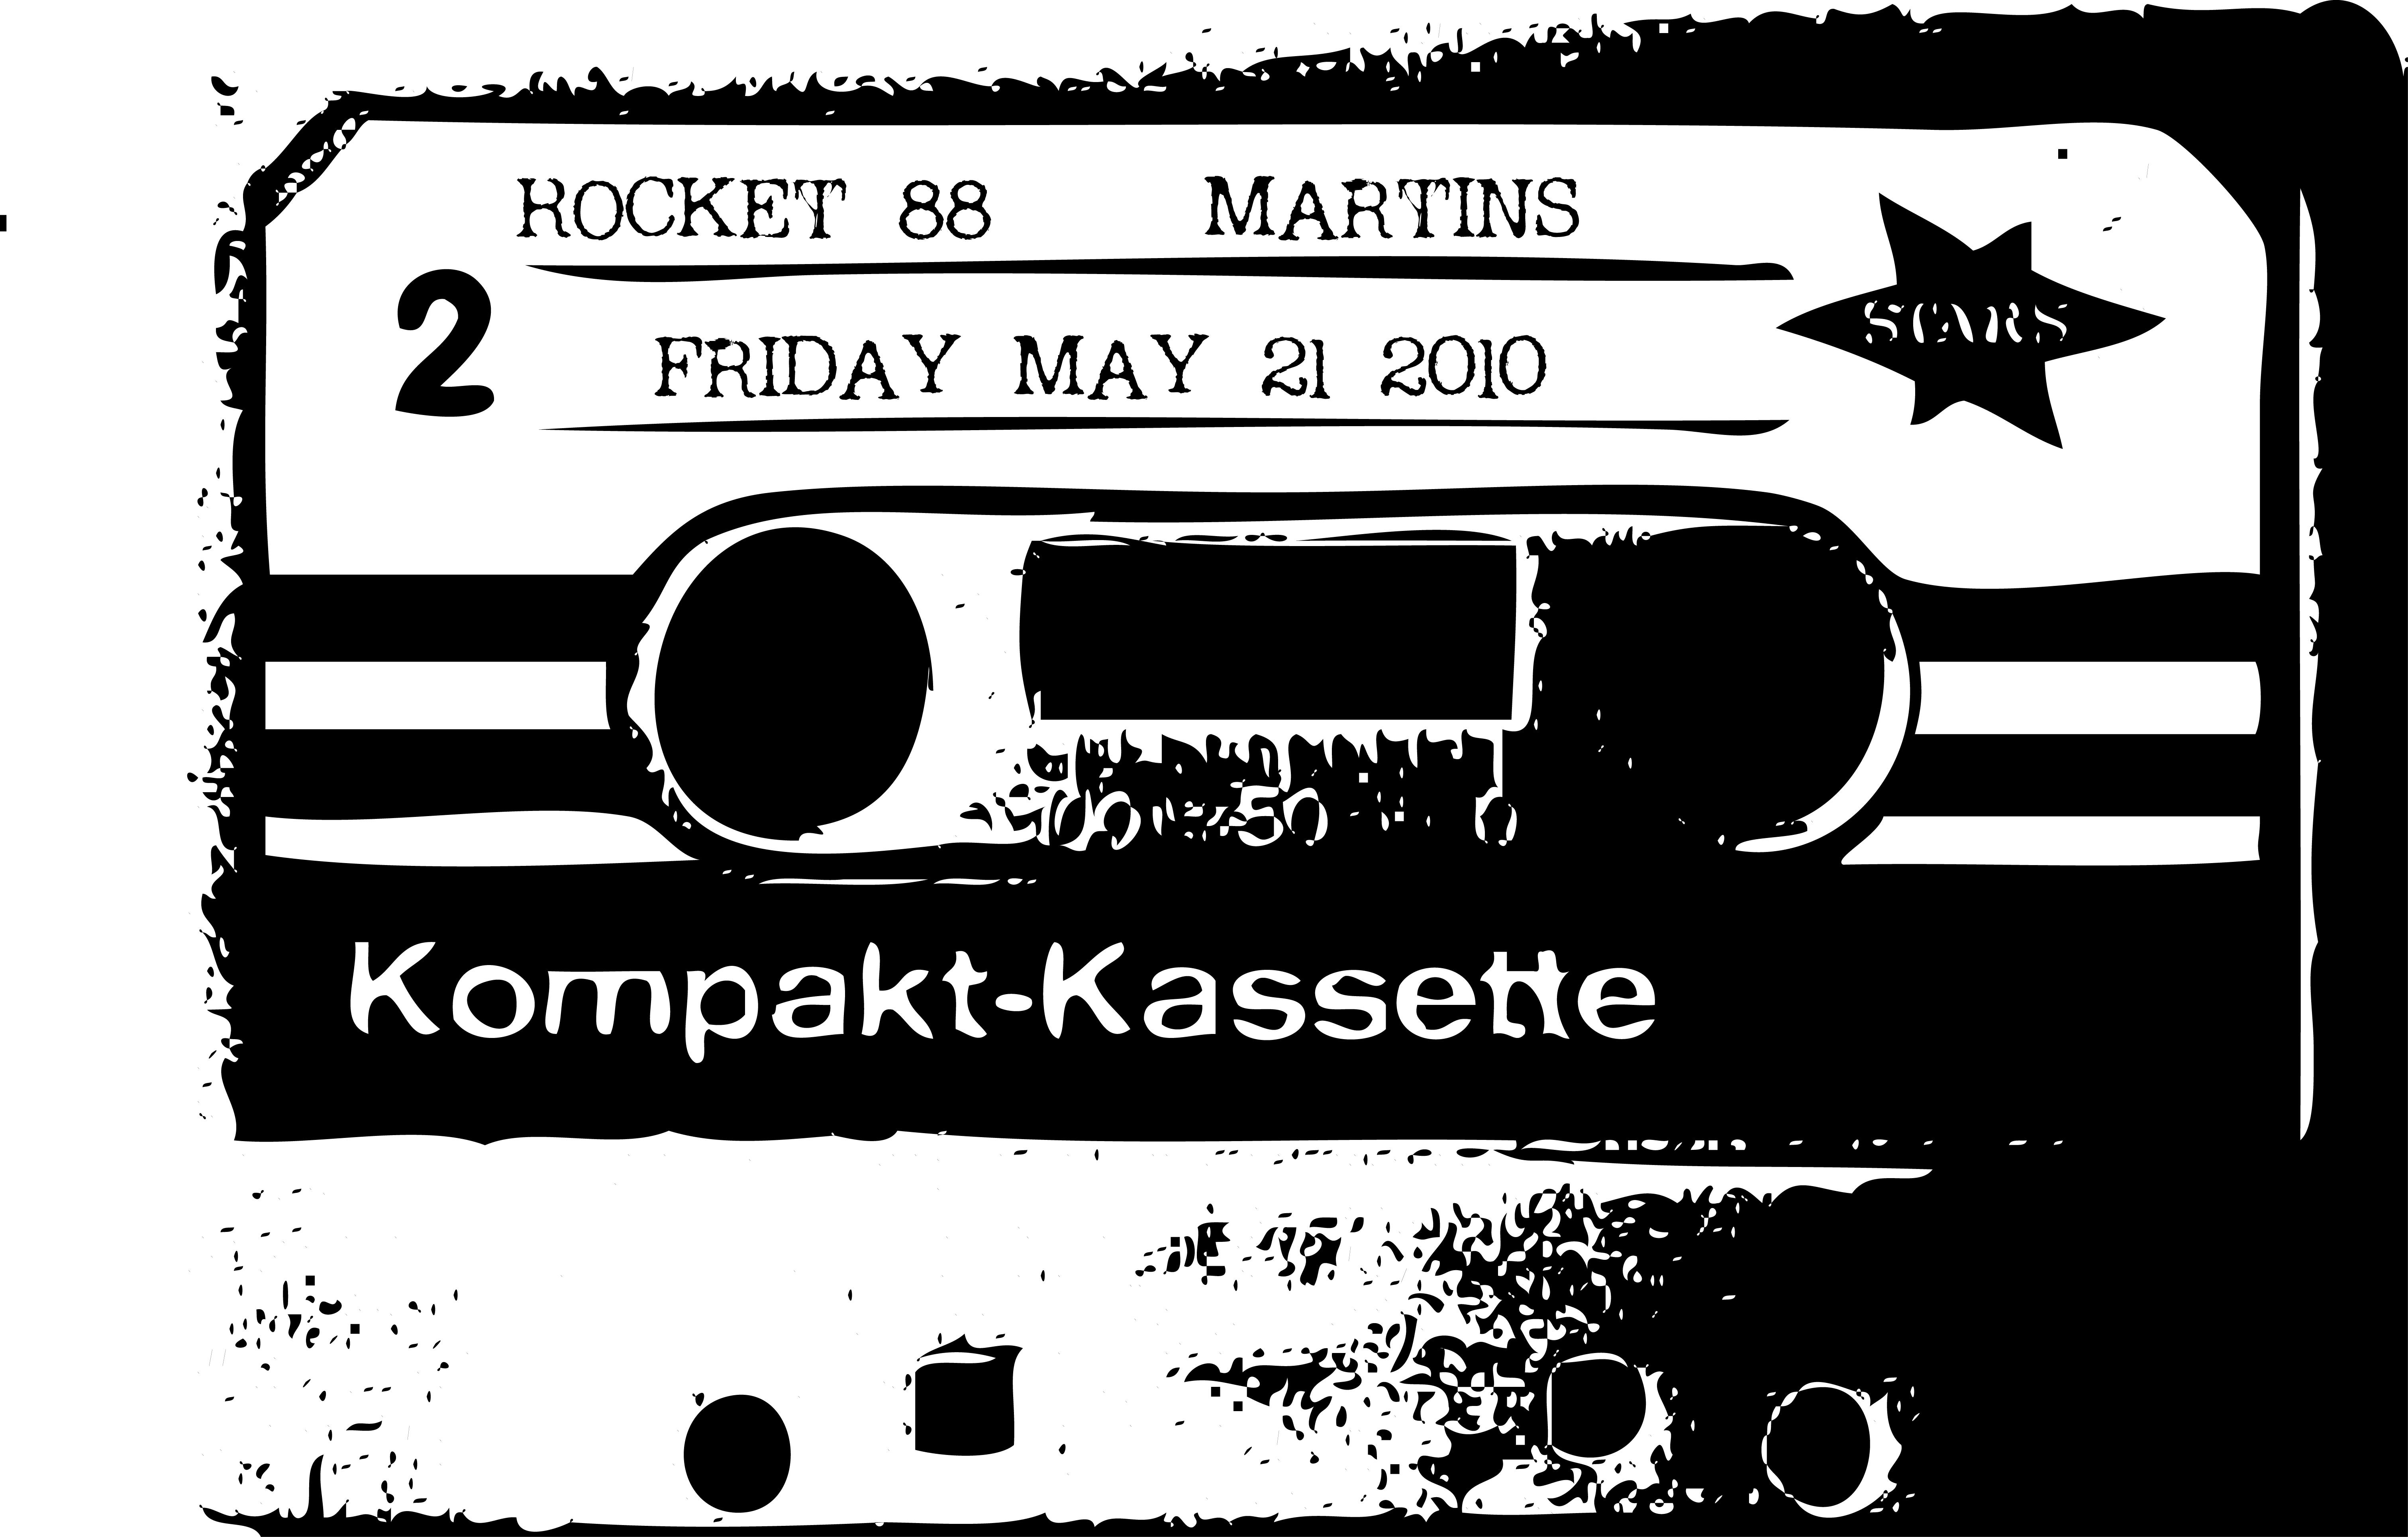 Martins-0521100-Cassette